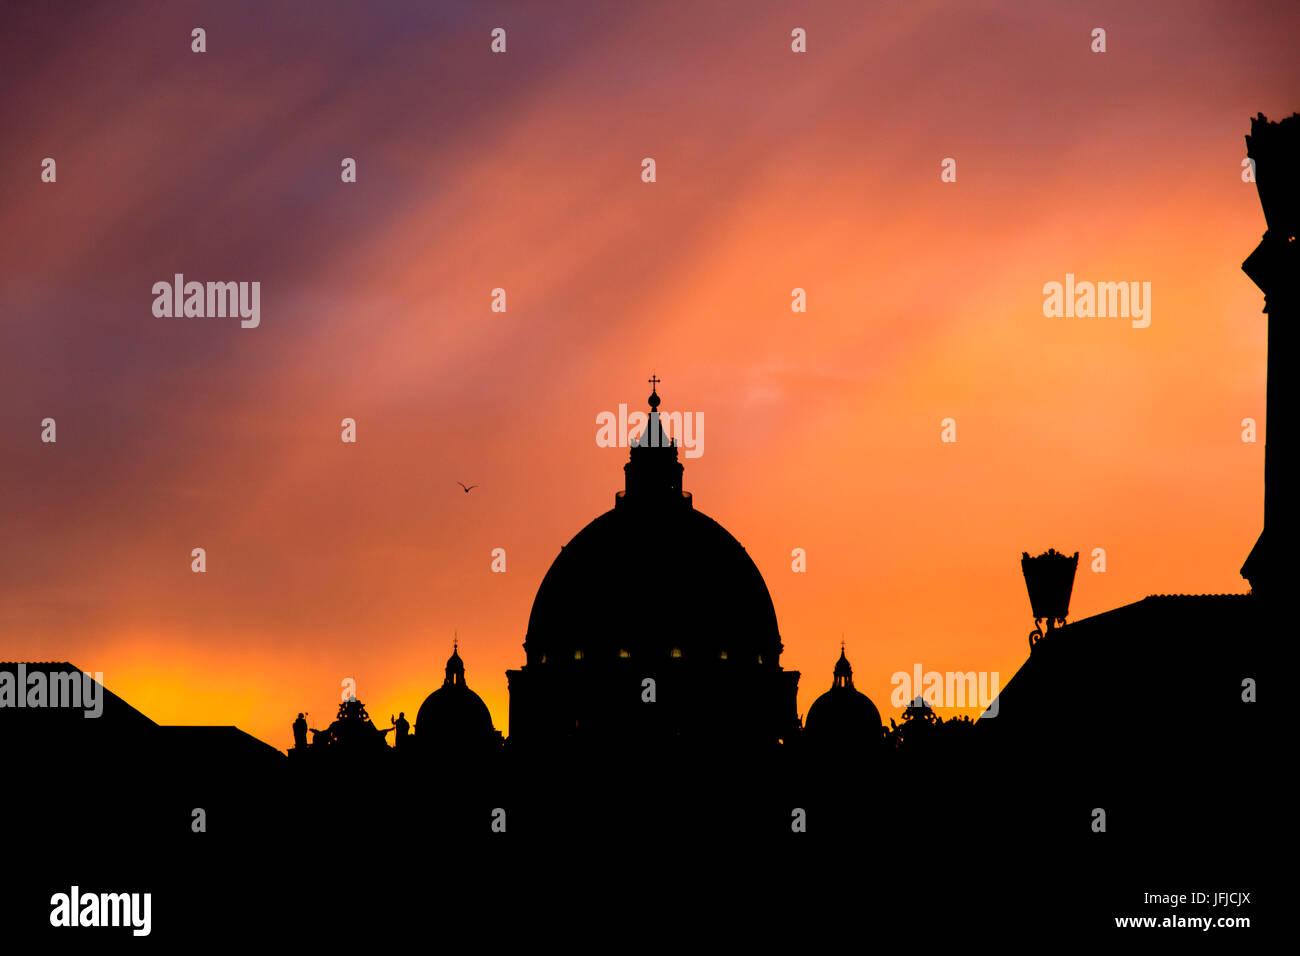 Europe, Italy, Lazio, Rome, Silhouette of St. Peter's Basilica's Dome Stock Photo